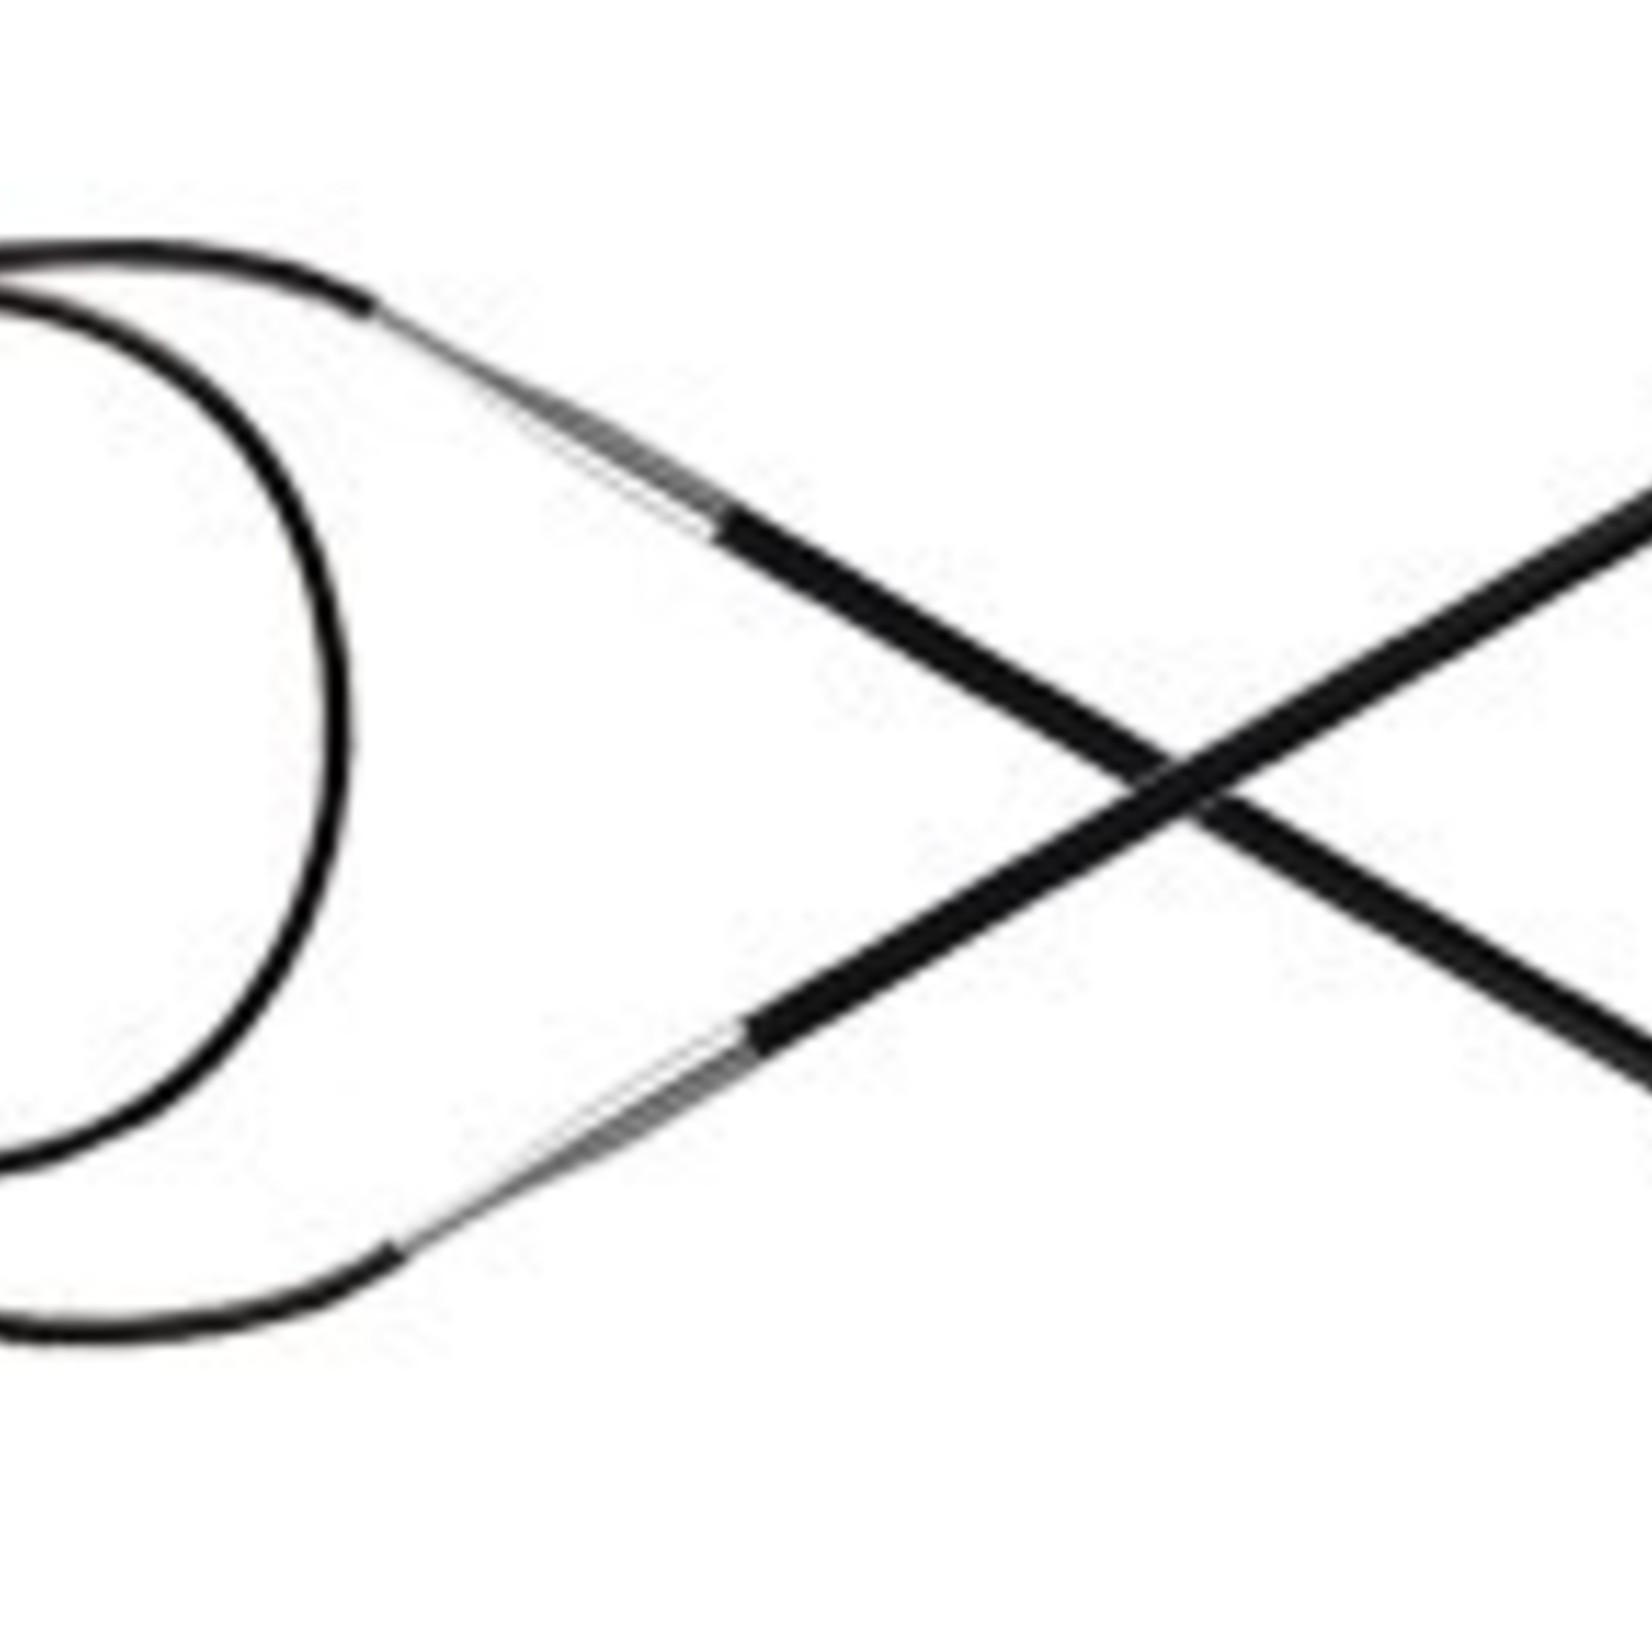 Knitter's Pride 6 Karbonz Circular 16